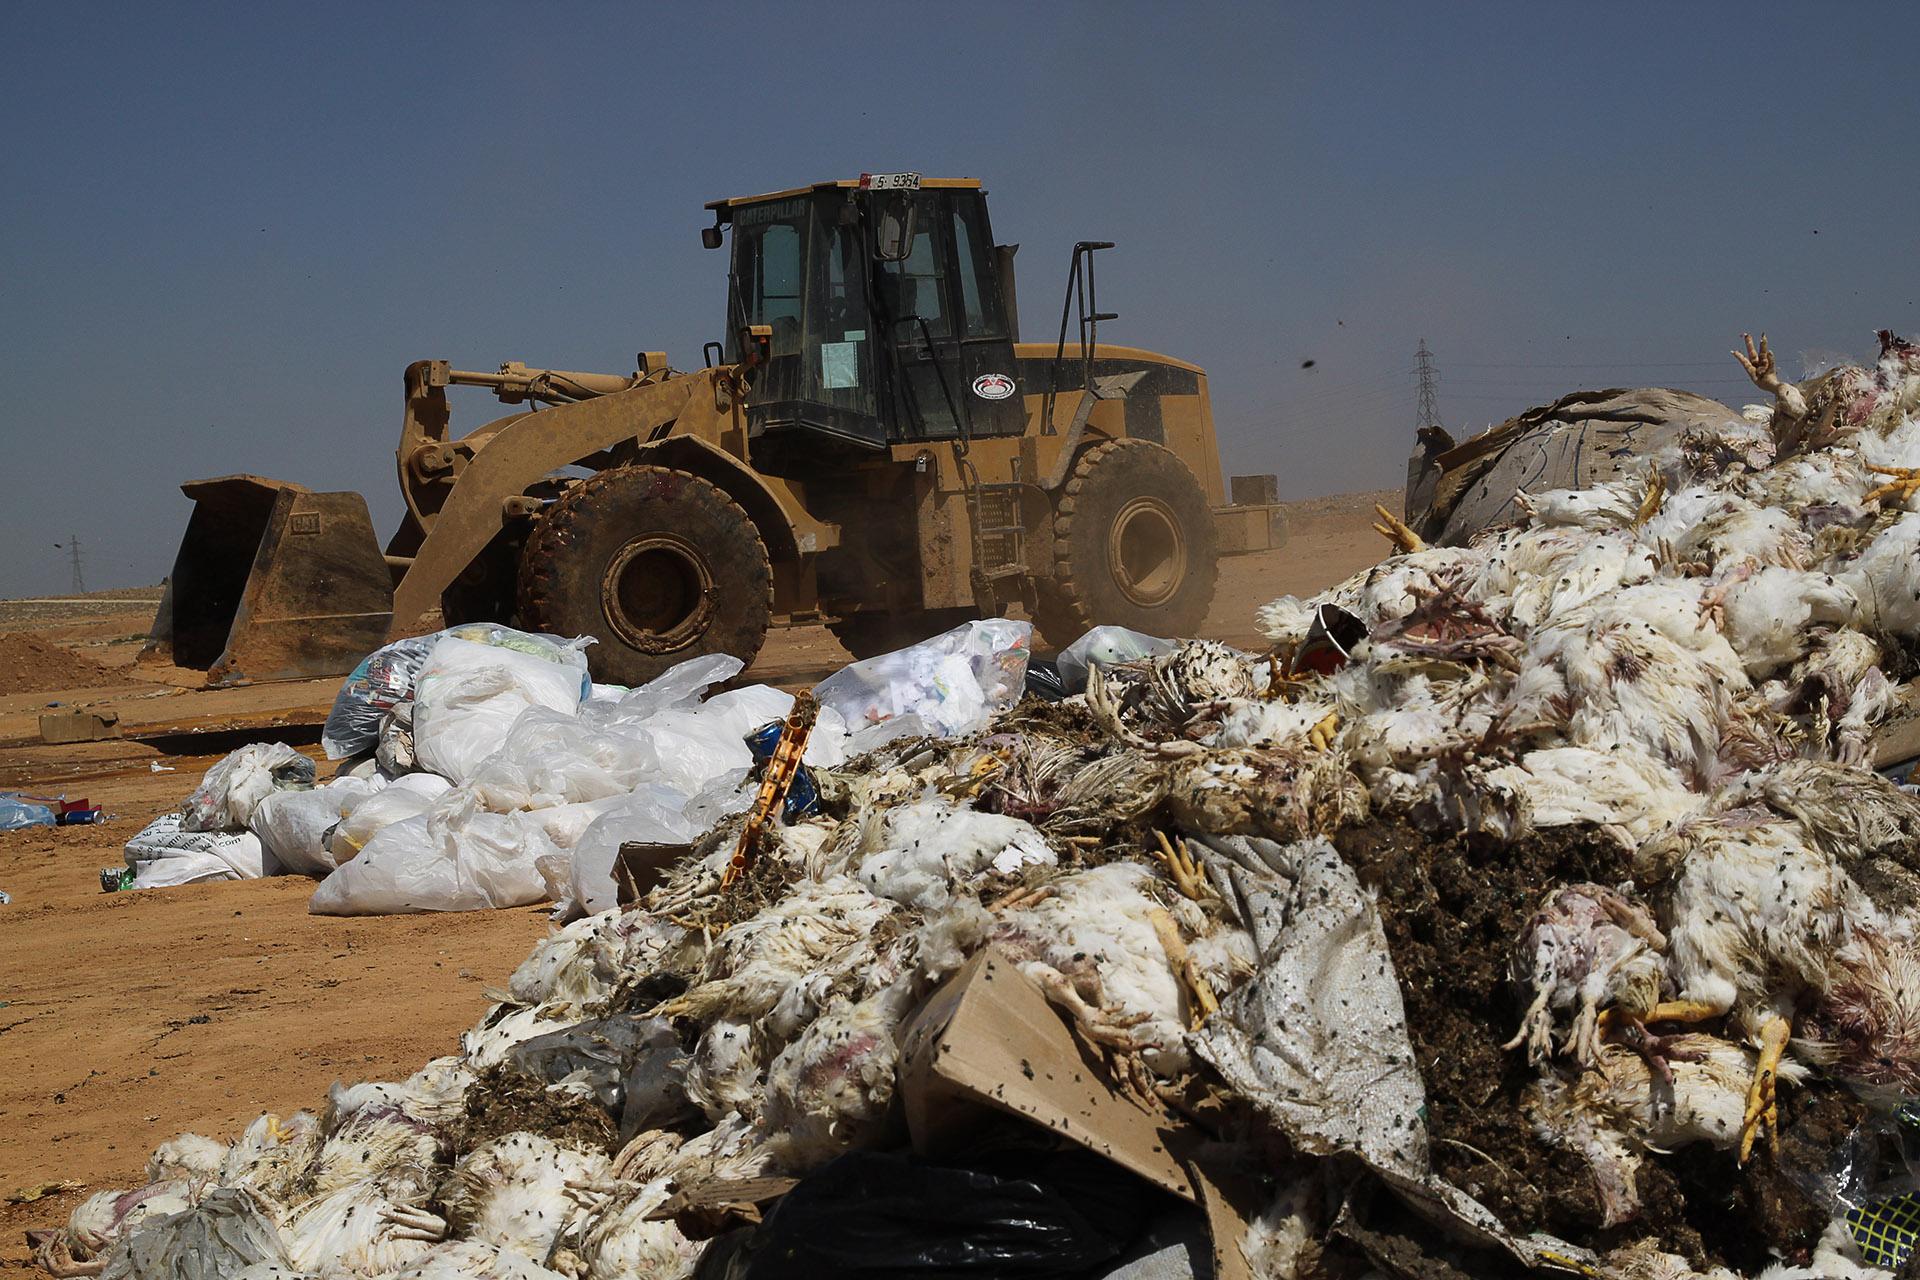 Carey Marks Photography, Al Huseyniyat landfill, Al Huseyniyat, Refugees, Waste Recovery, Waste, Syrian refugees, Palestian refugees, UNHCR, recycling, bulldozer, Caterpillar